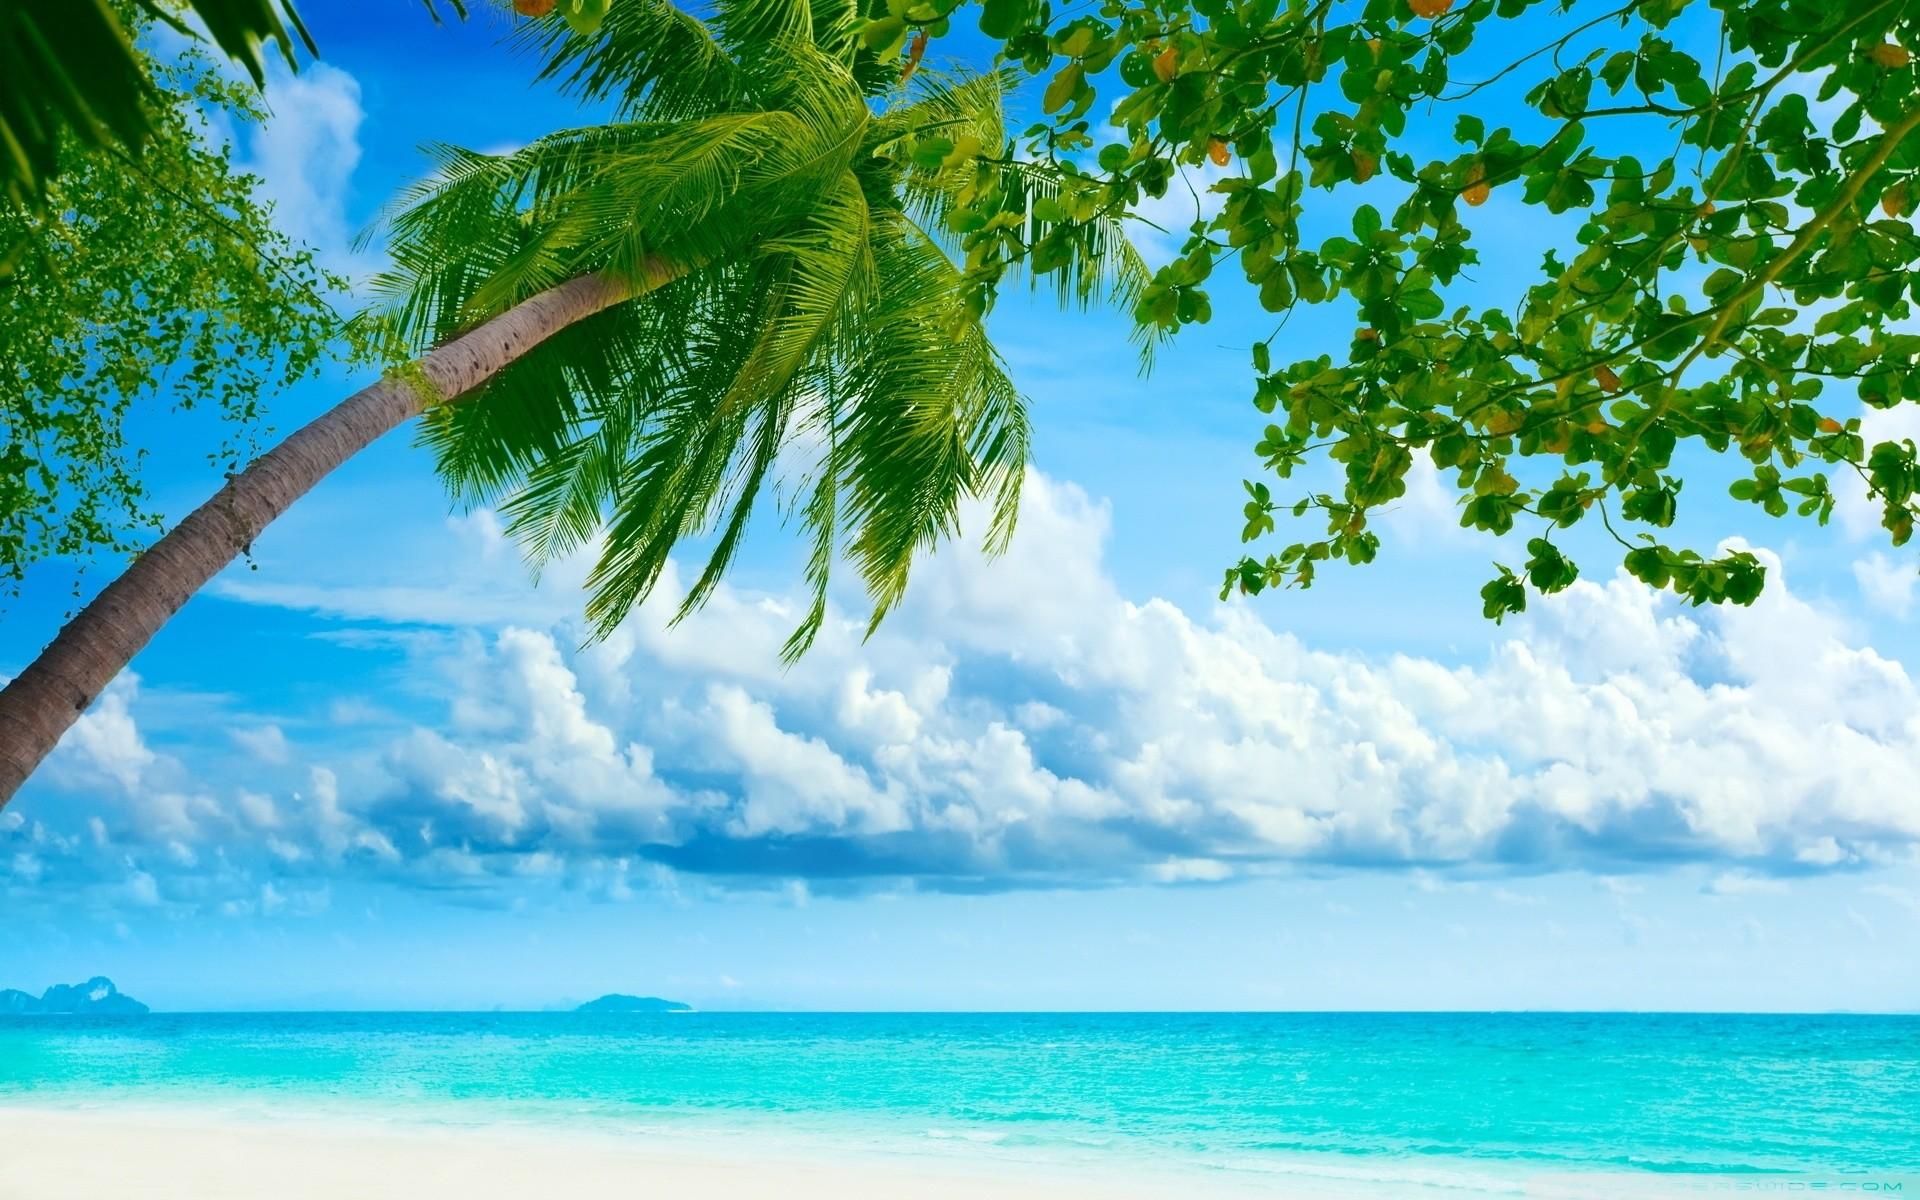 1920x1200 Tropical Beach Resorts HD Wide Wallpaper For 4K UHD Widescreen Desktop Smartphone